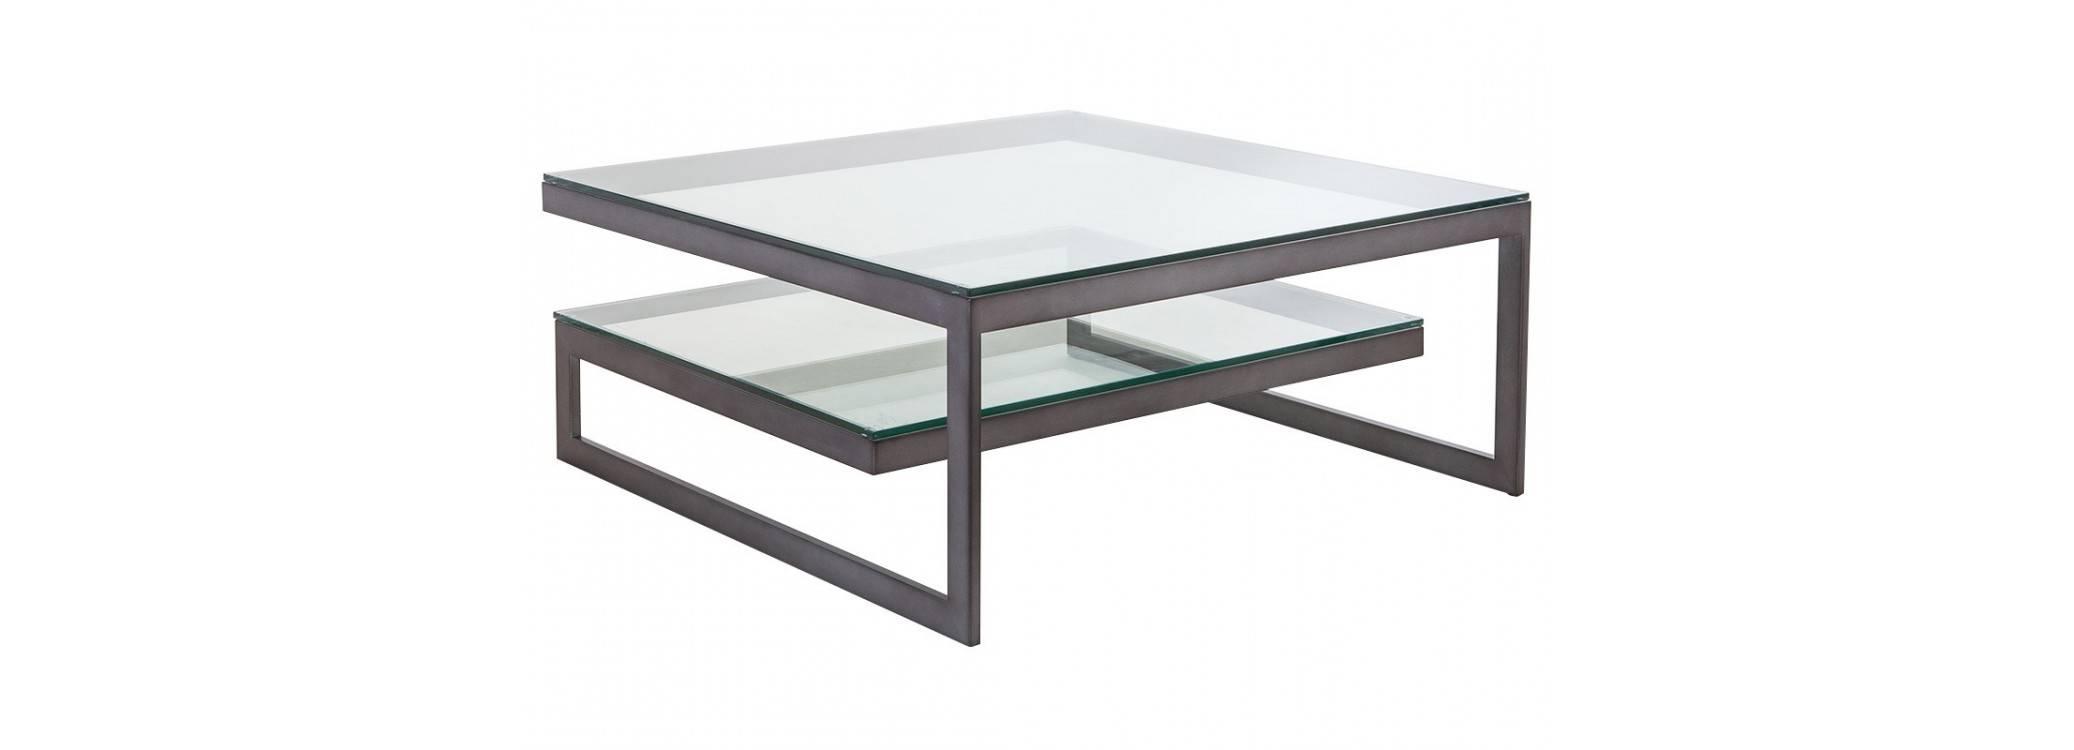 Table basse carrée Azura